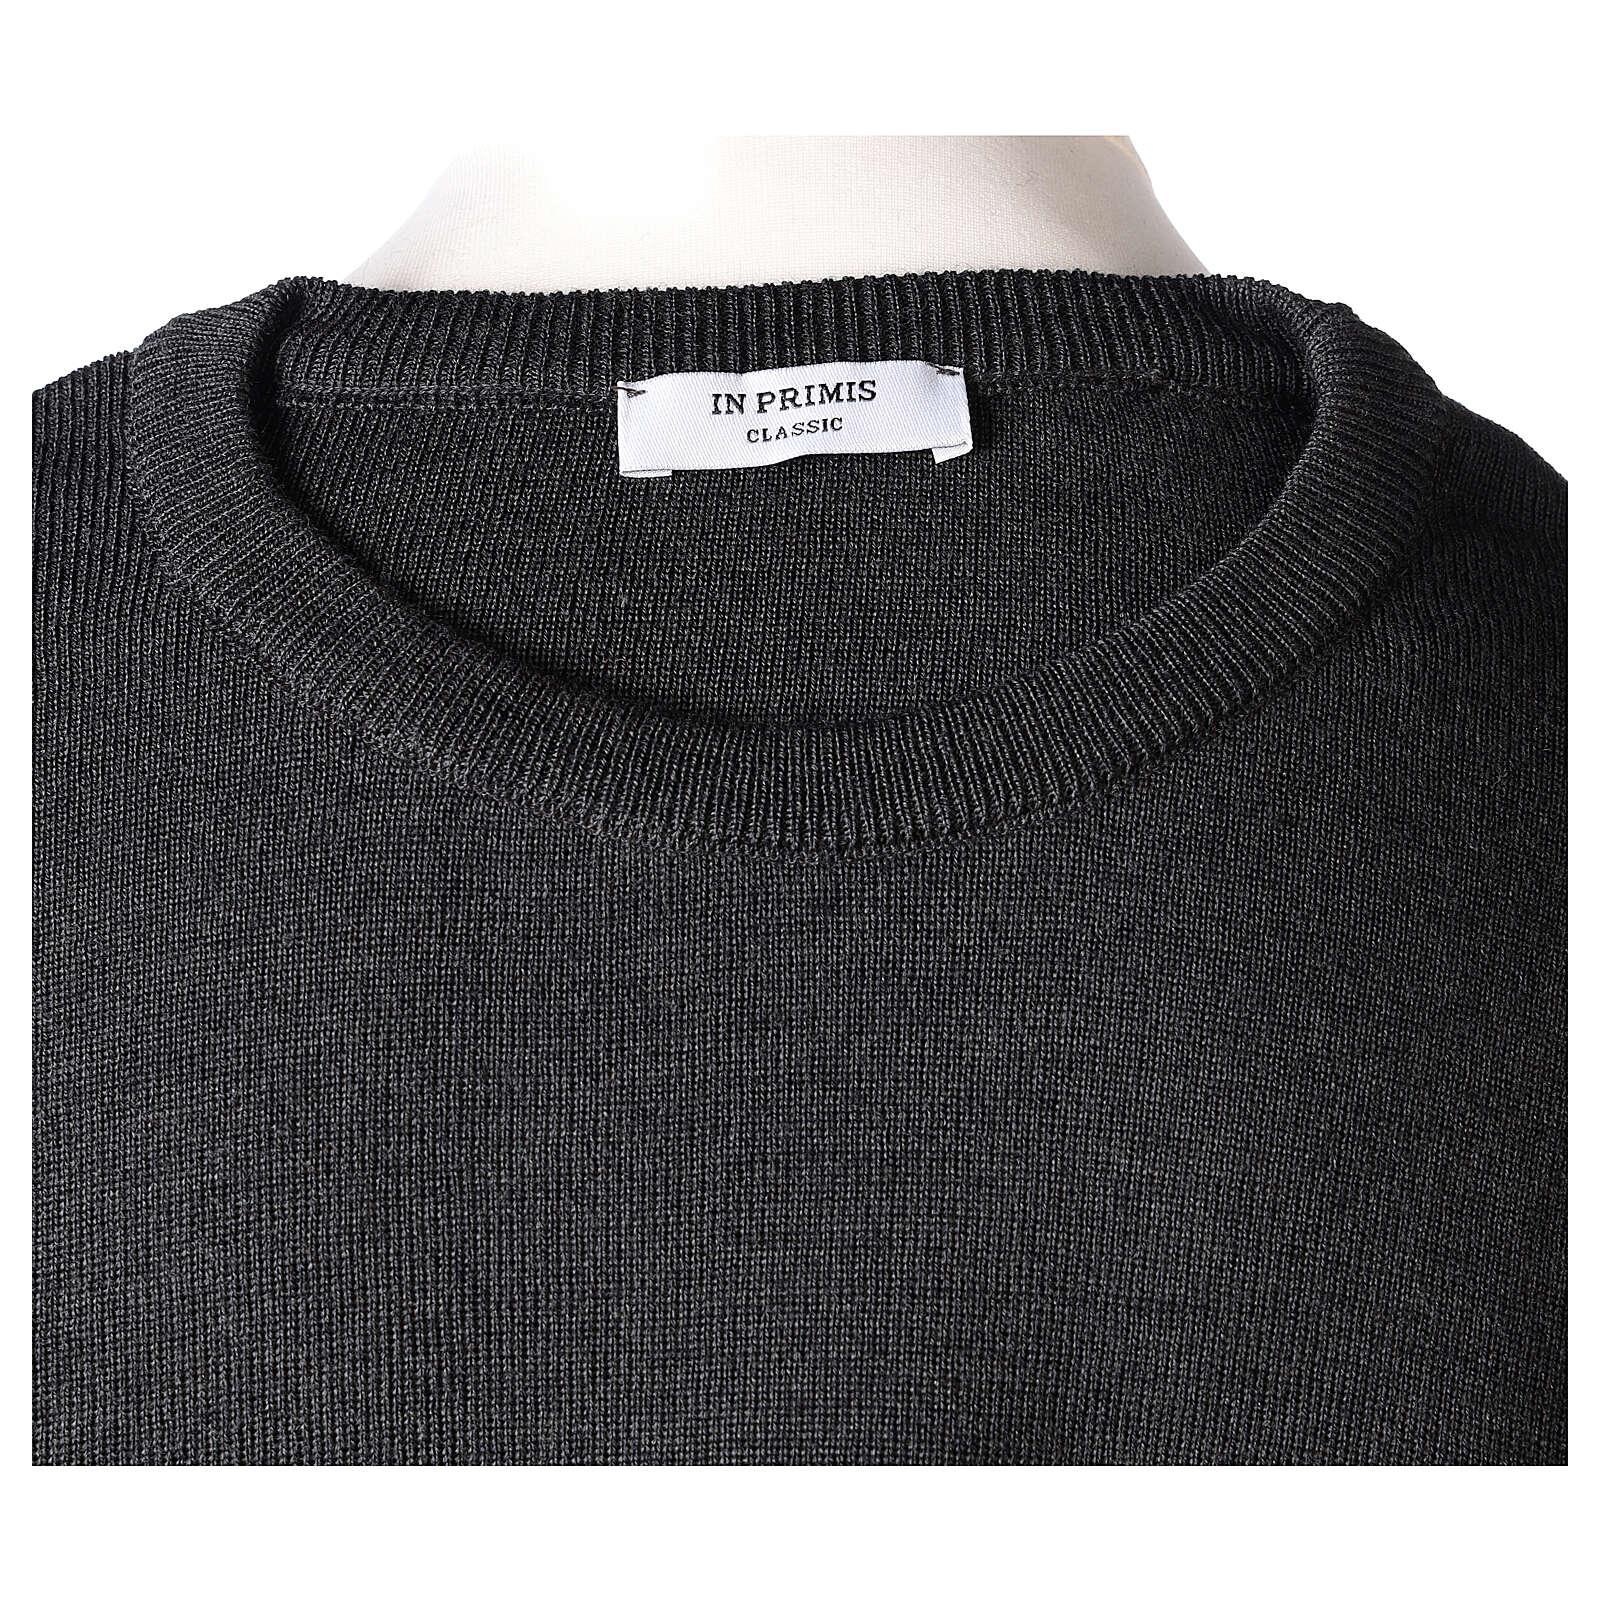 Crew neck clergy grey jumper plain fabric 50% acrylic 50% merino wool In Primis 4